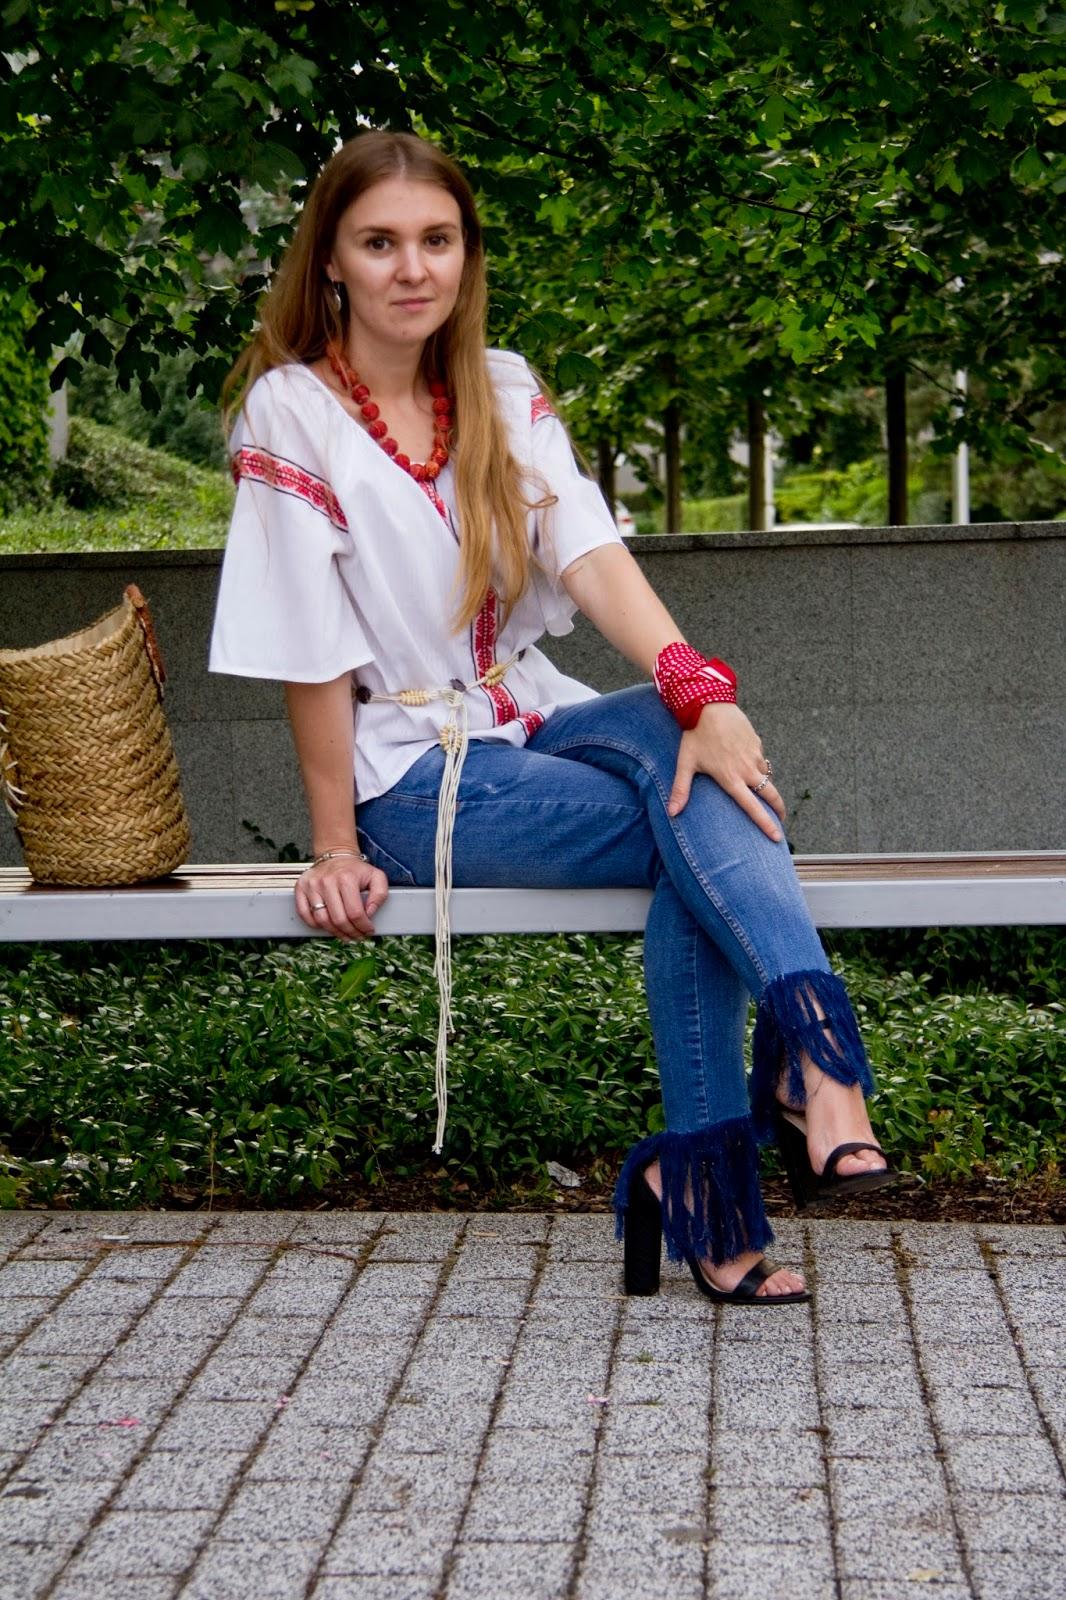 http://valerysdailyinspiration.blogspot.com/2016/07/frayed-jeans-and-vyshyvanka.html